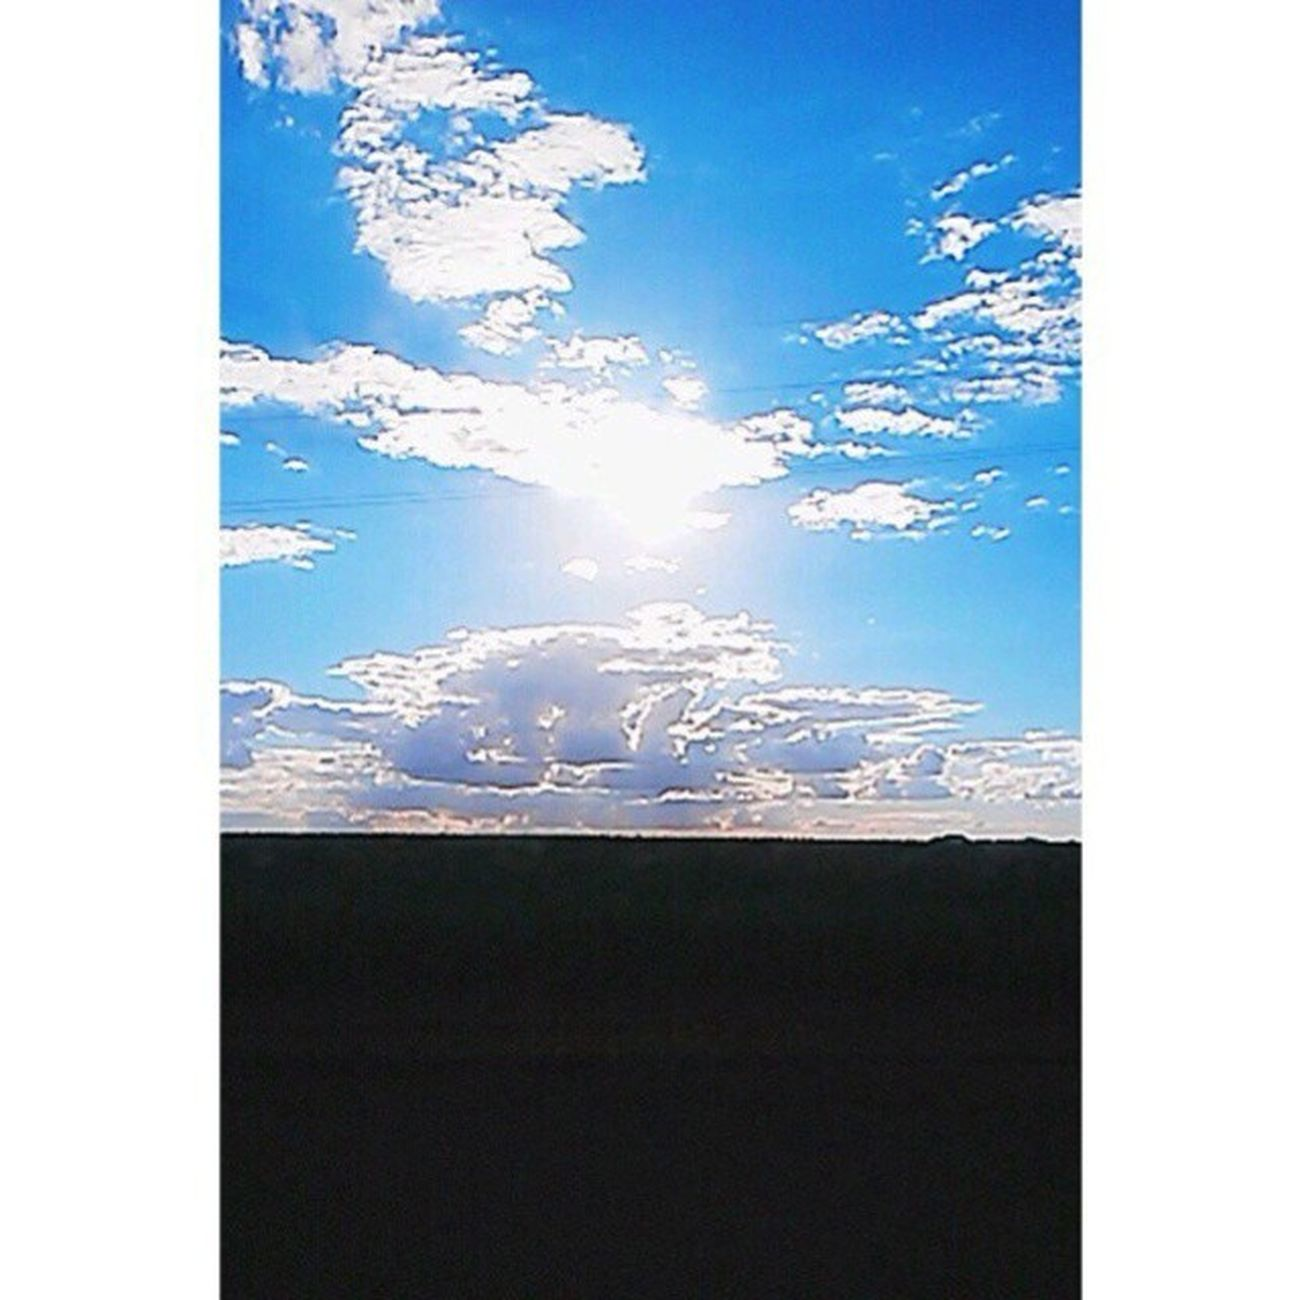 Céu de Mato Grosso! :) Foto: @samirasathler ________________________ MatoGrosso_Brasil Matogrosso CentroOeste Bresil  Brasil Brazil Brazilien Southamerica World Travel VisitBrasil IloveBrazil VejaMatoGrosso MtcomVc BrasilSensacional Magnifique Belezasnaturais